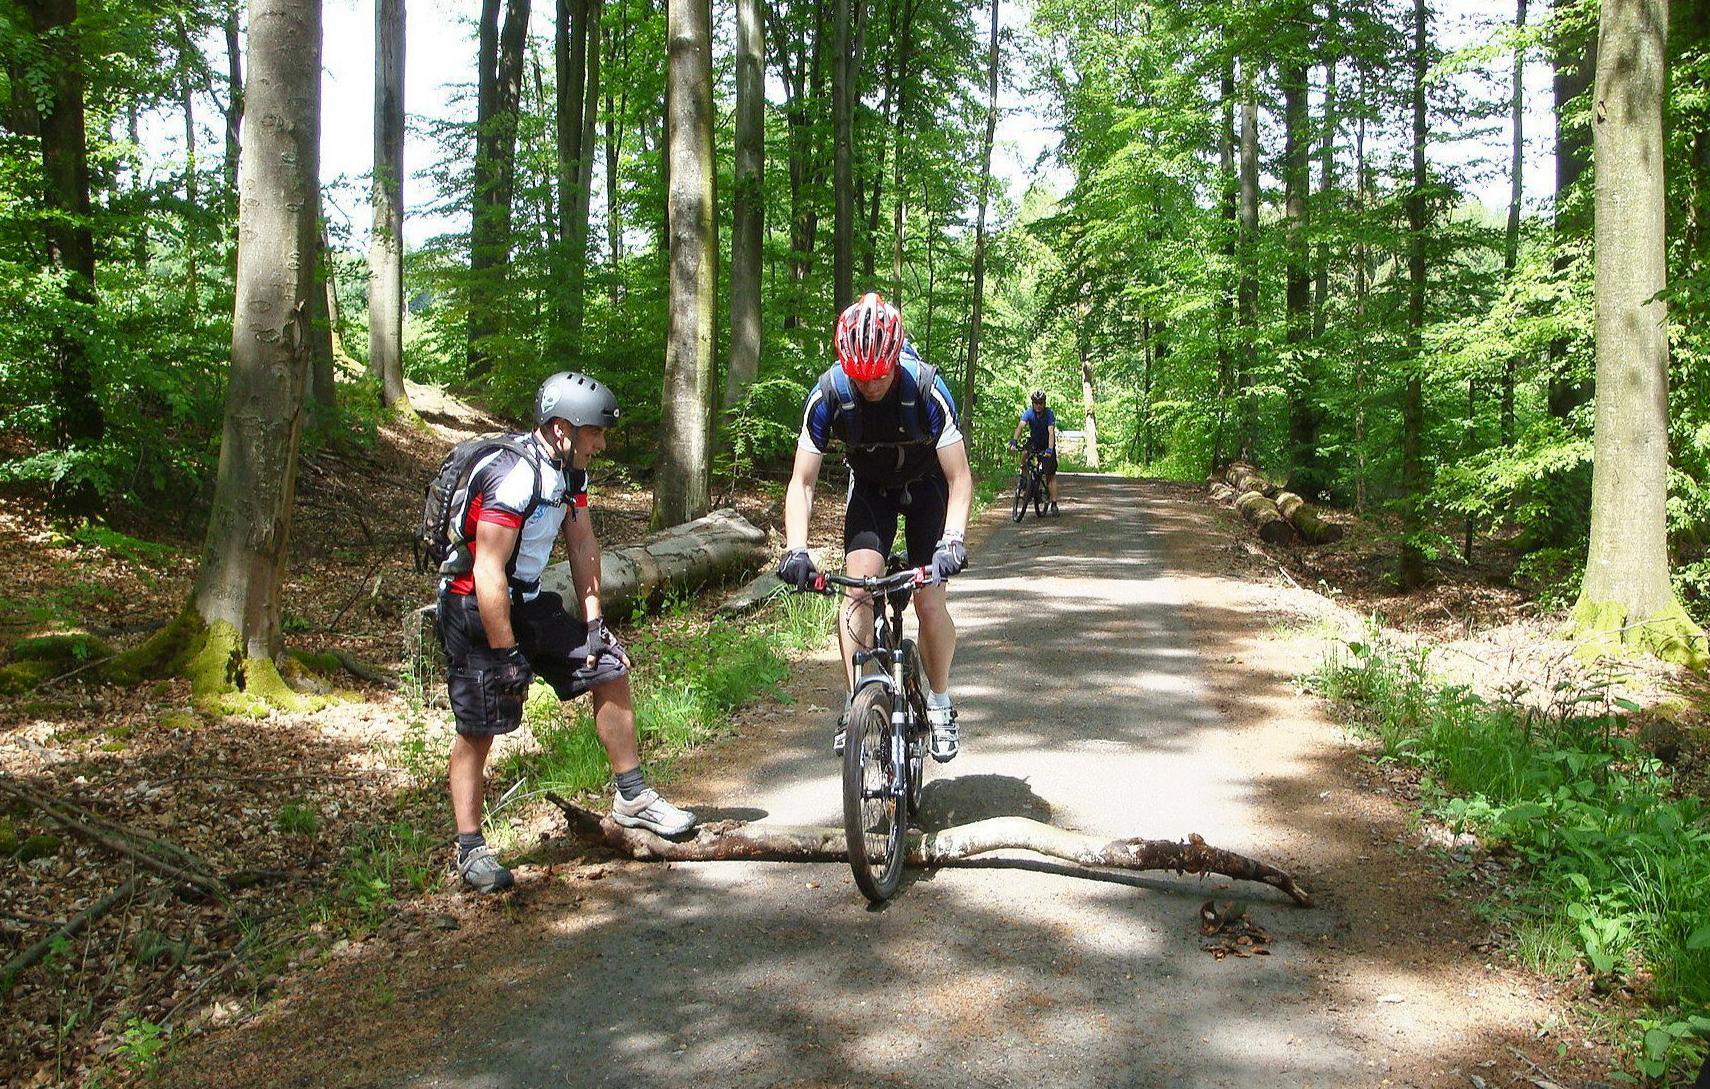 mountainbike-kurs-hattingen-bg1